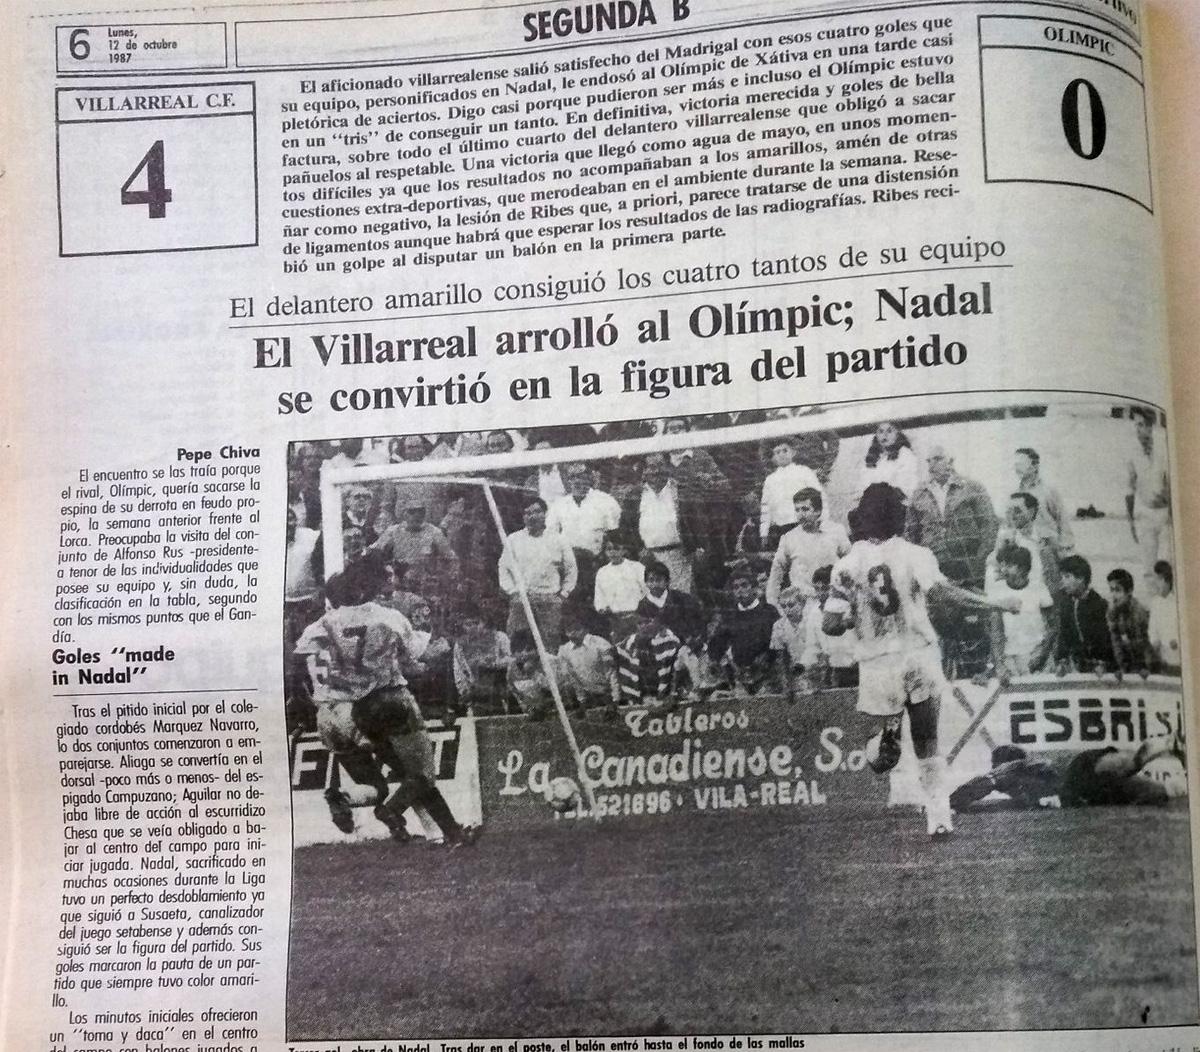 sebastian nadal mejias bufalo olimpic - Noche record para el Villarreal